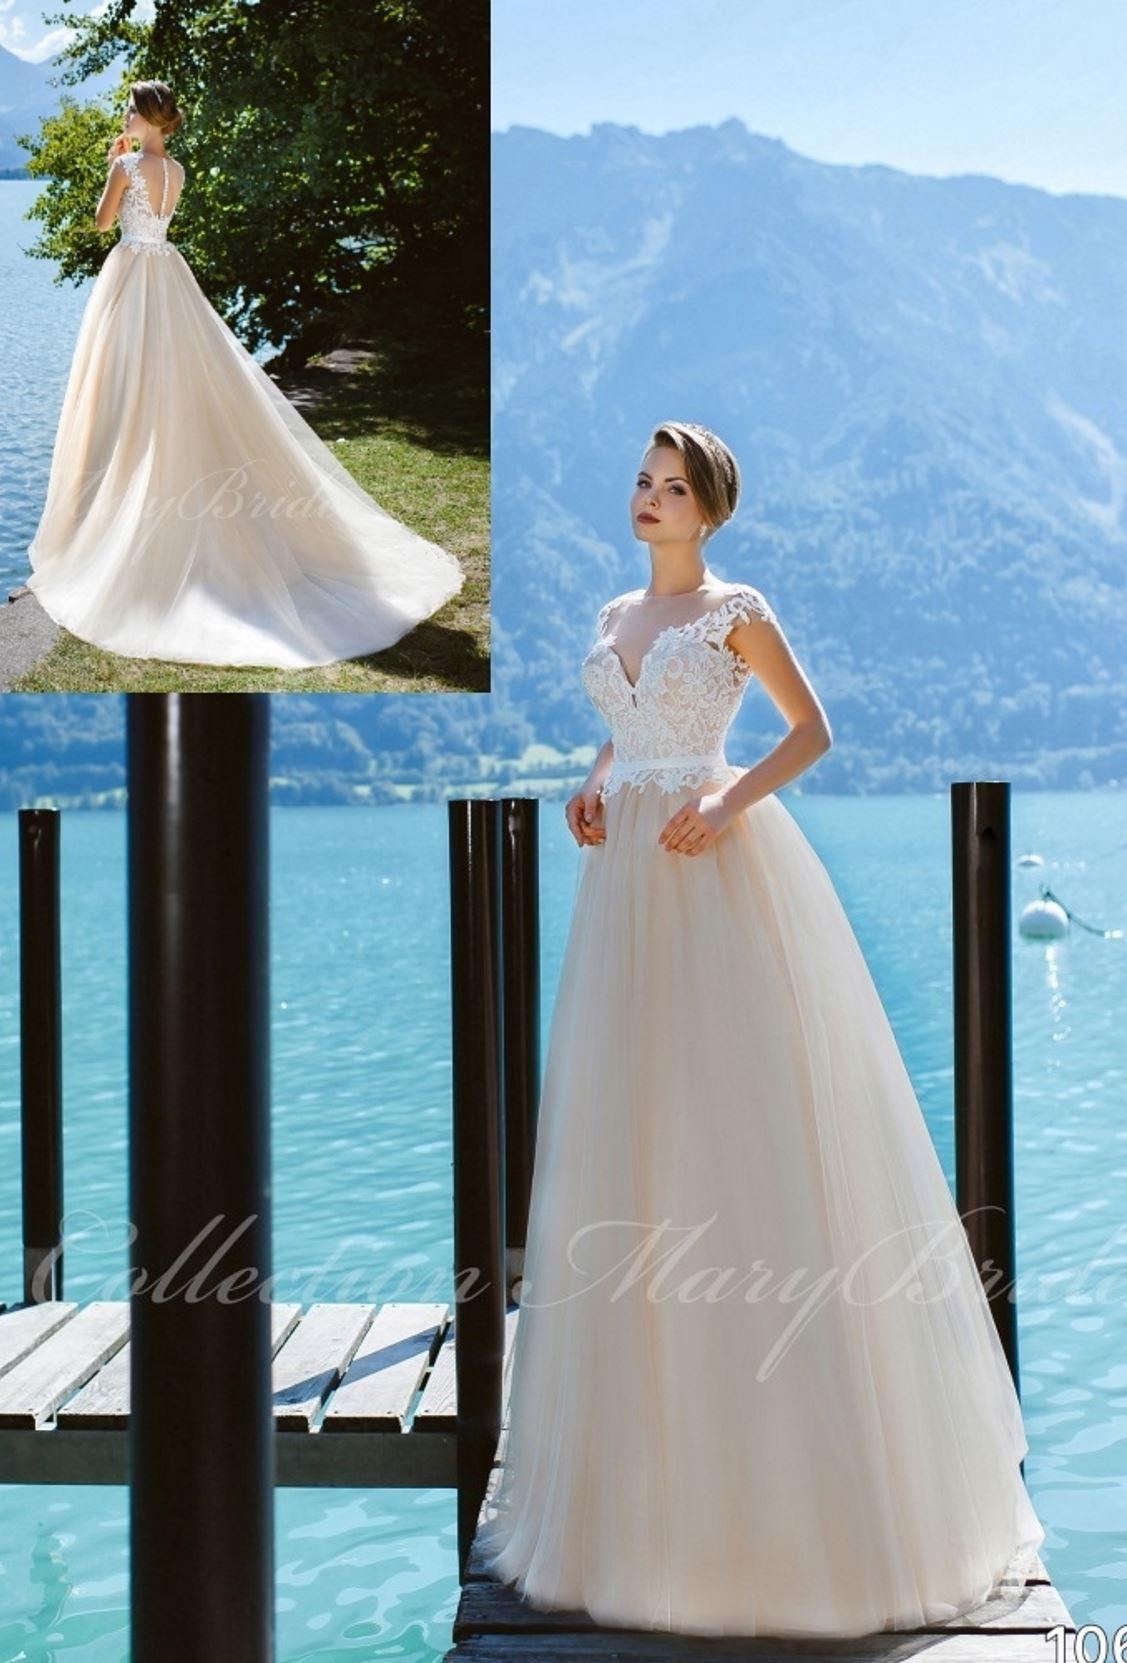 Nett Precio Alquiler Vestido Novia Galerie - Hochzeit Kleid Stile ...